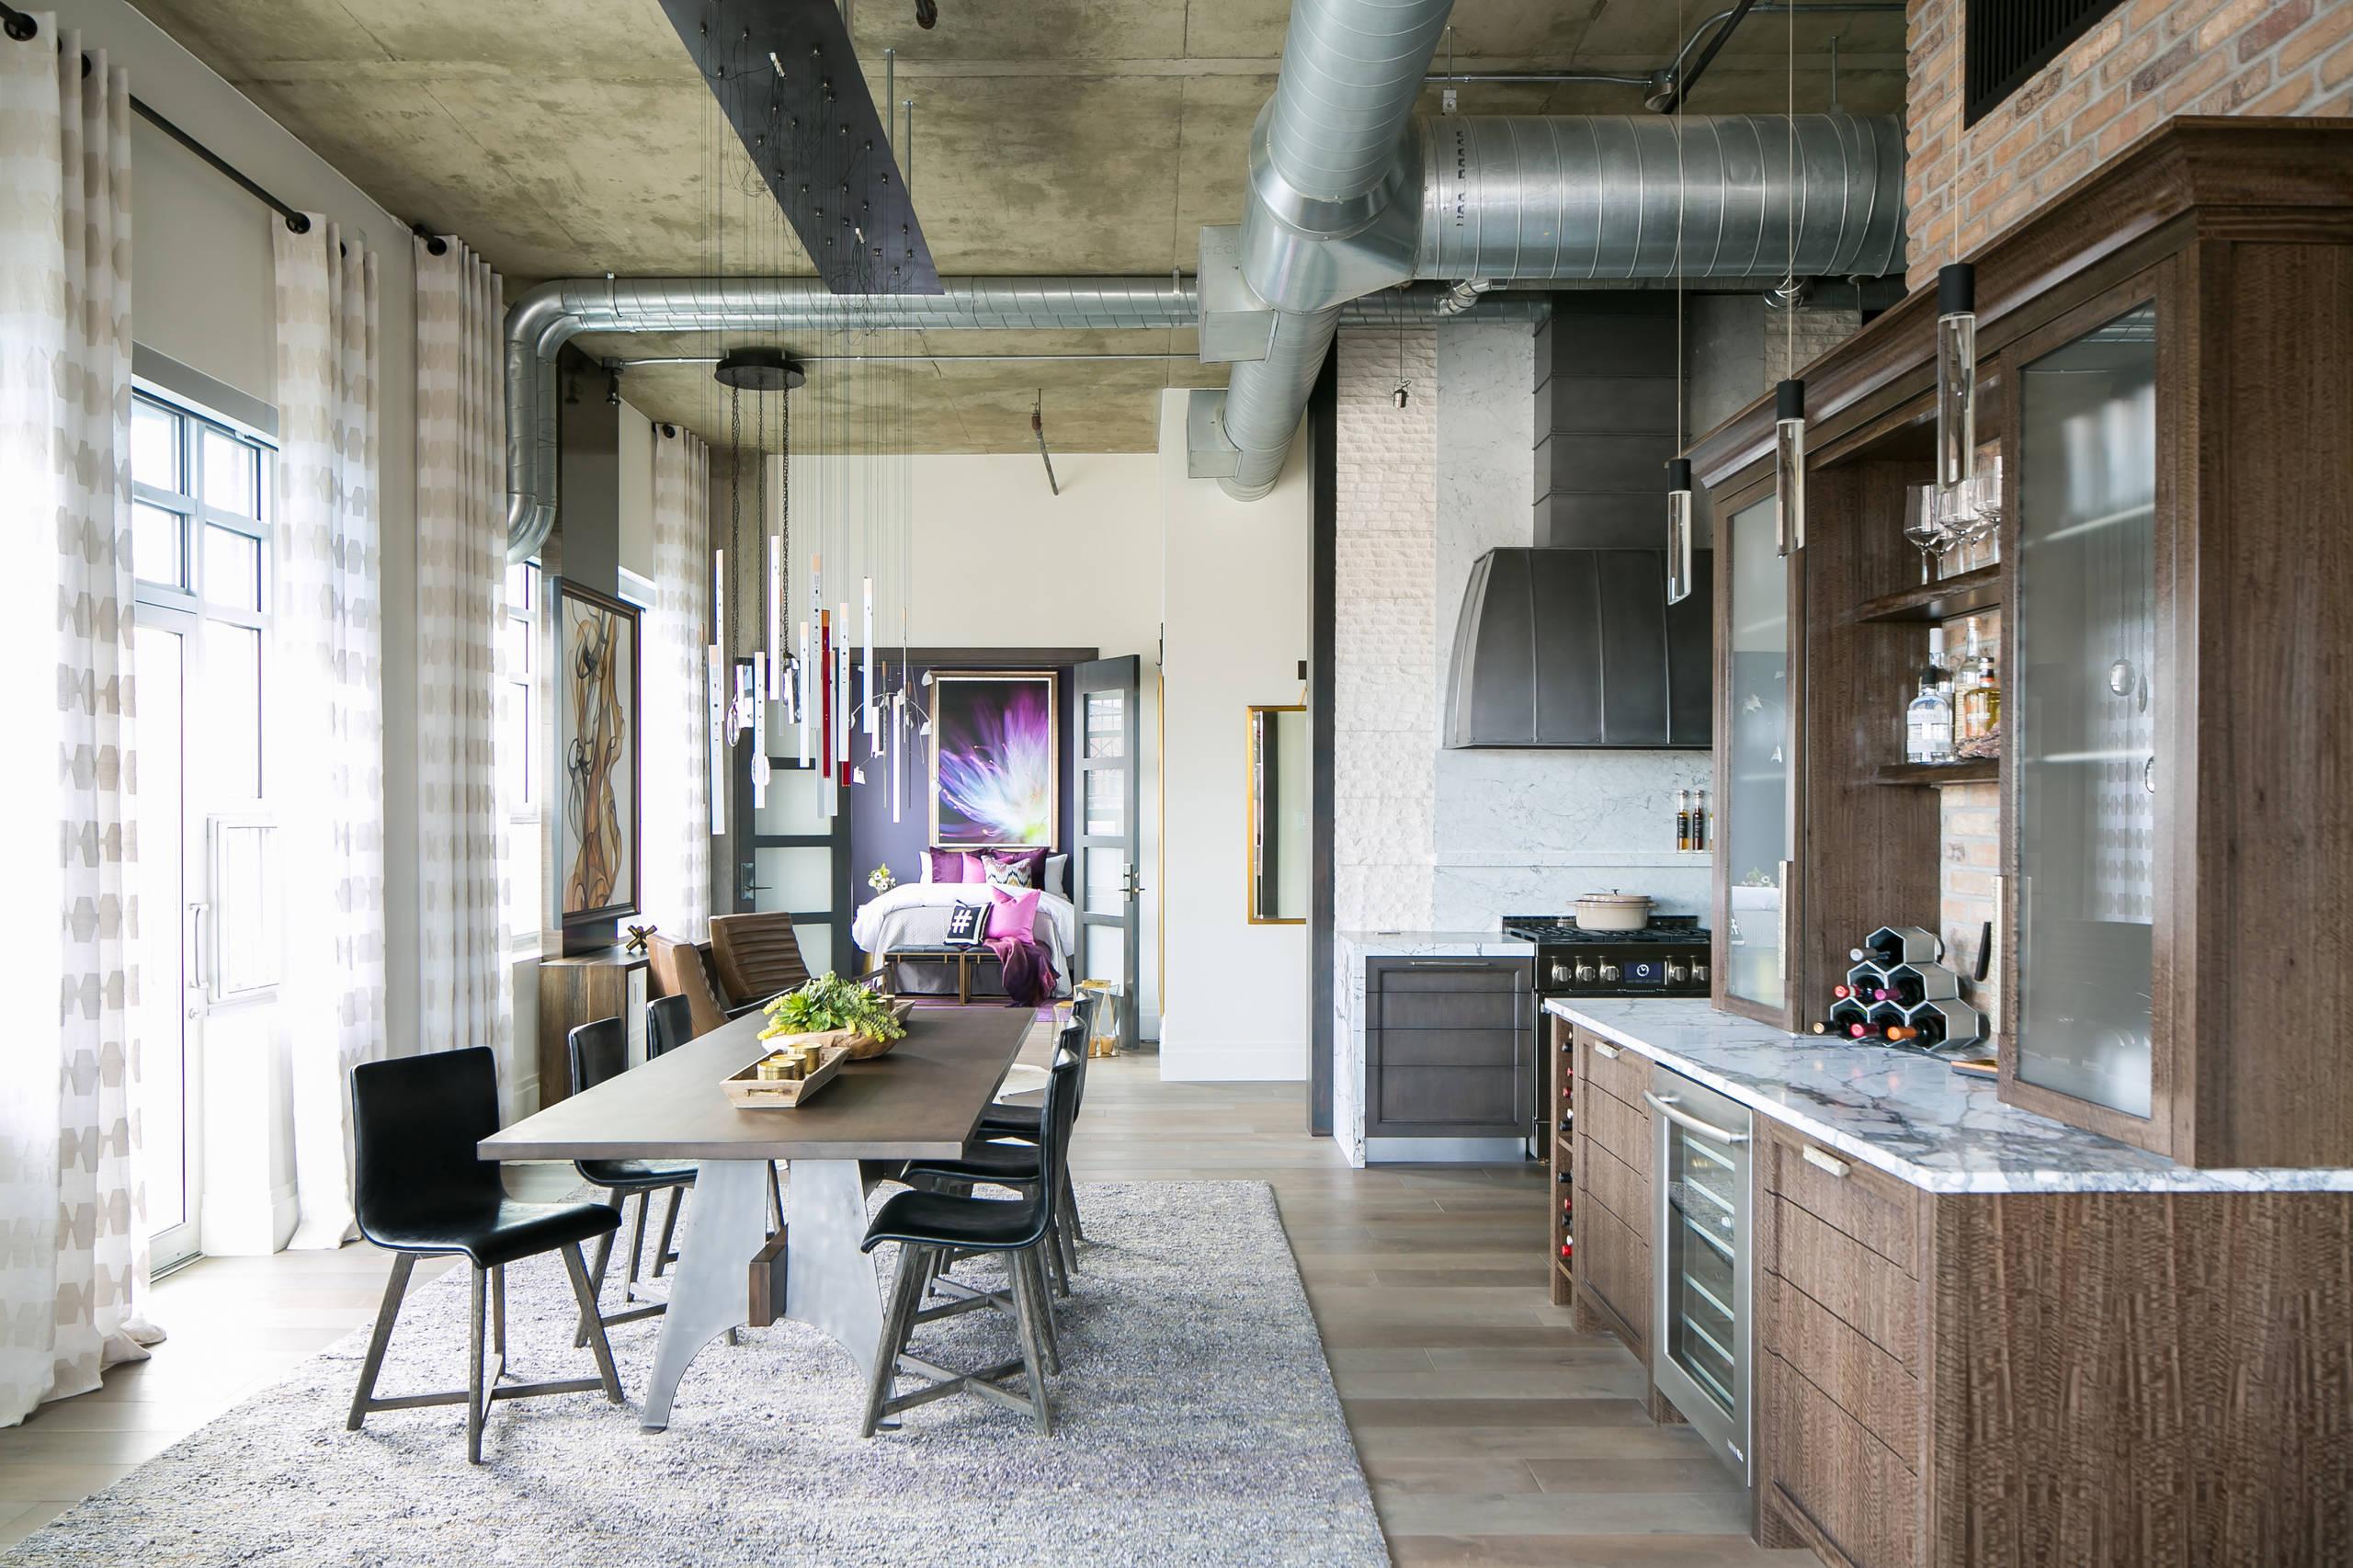 Denver Colorado Residence Loft Style Dining room